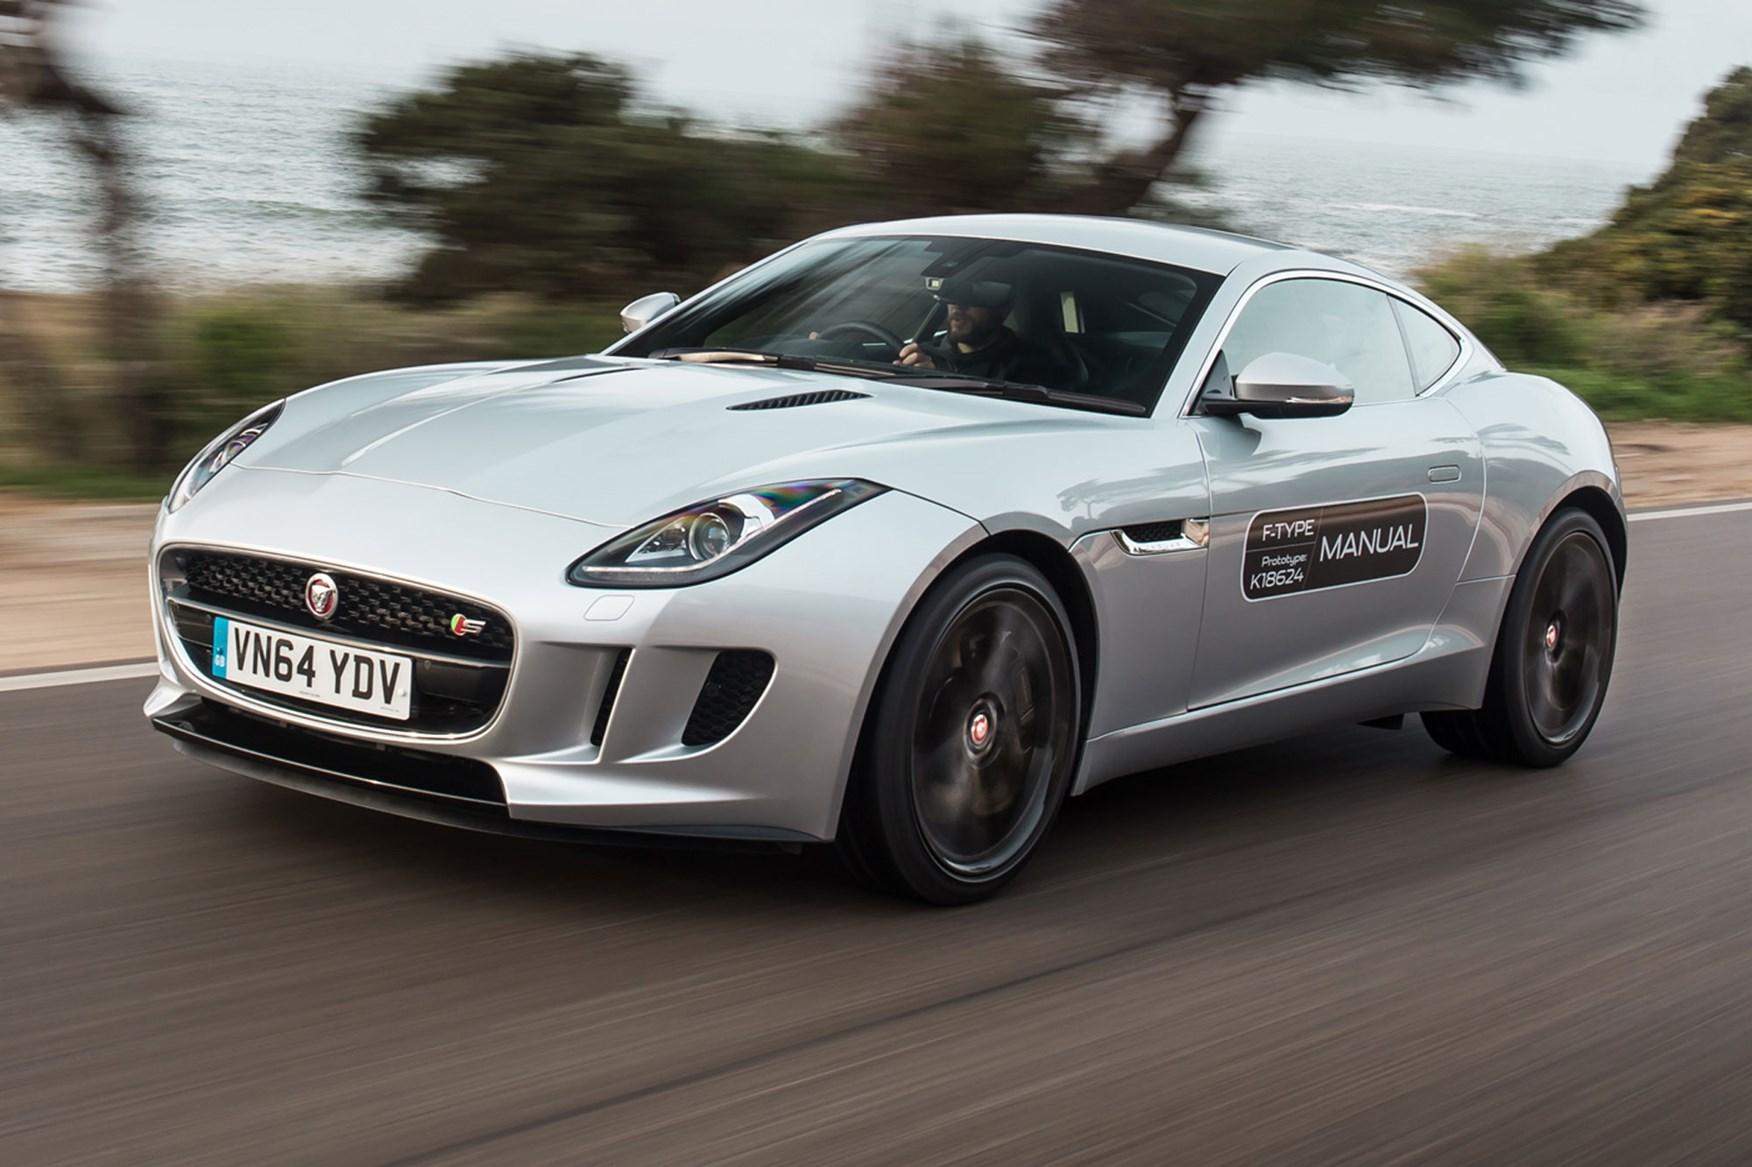 Jaguar F-type V6 S manual (2015) review